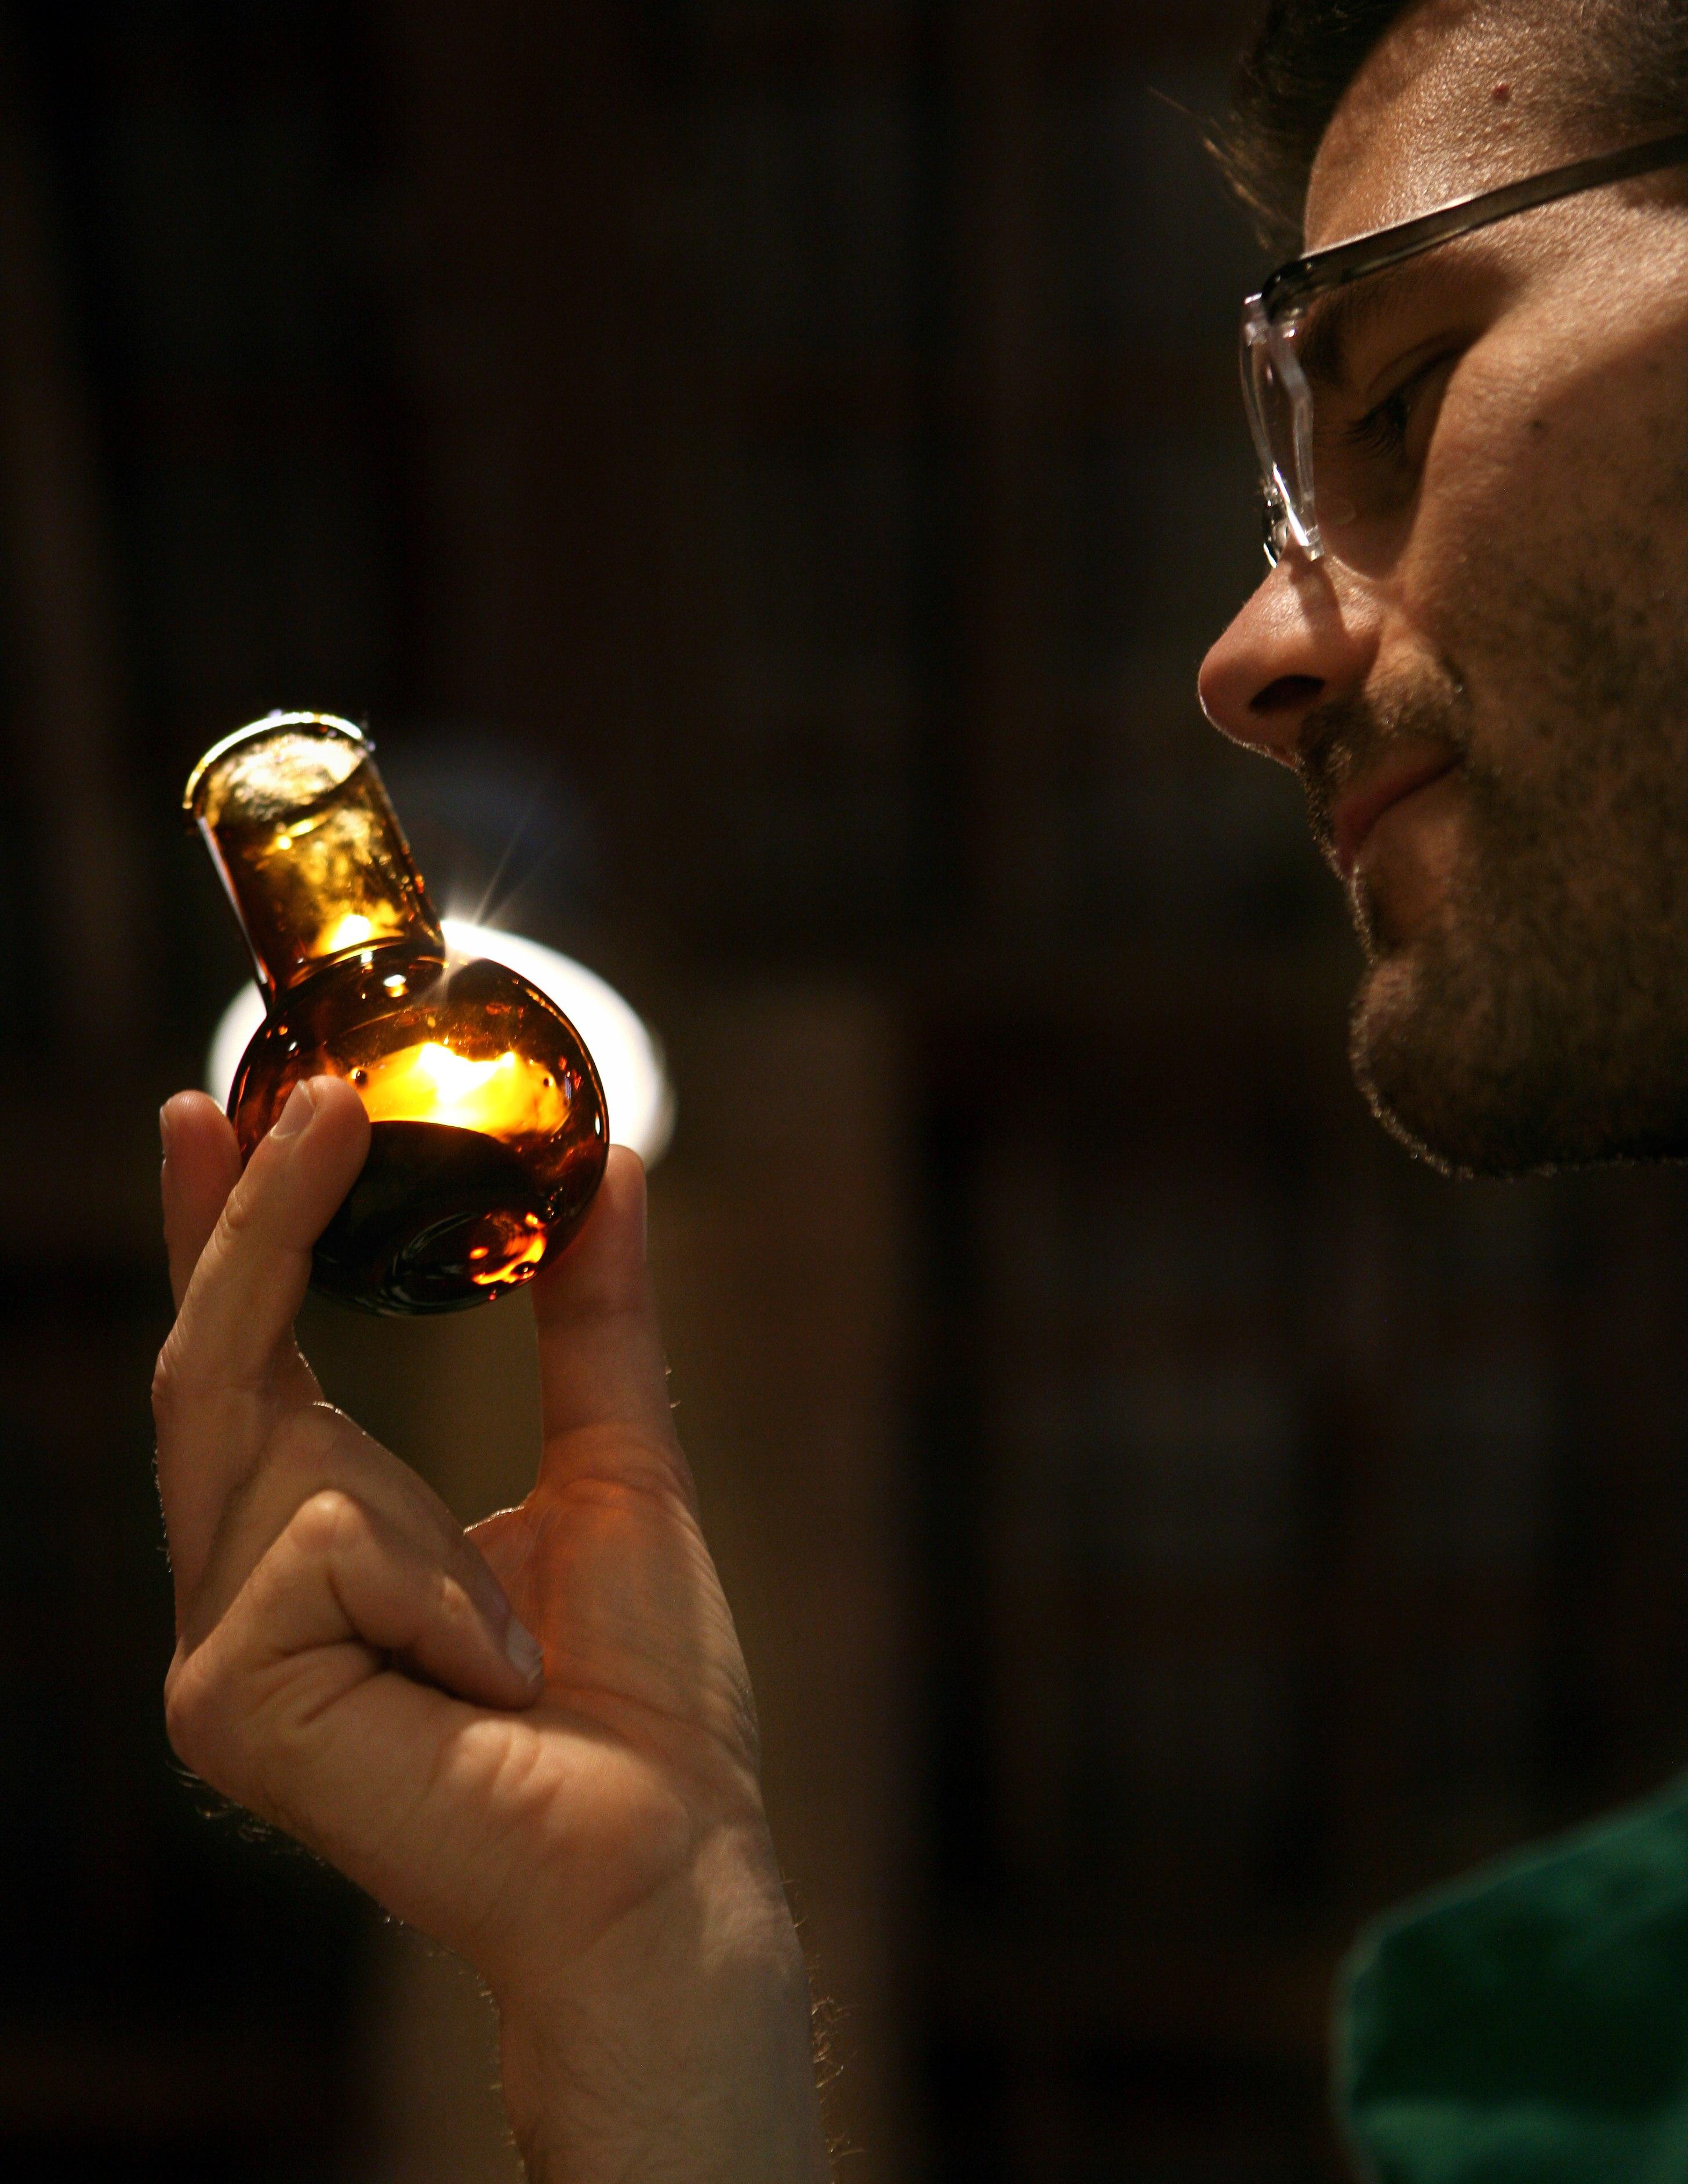 Walking and tasting tours in Emilia-Romagna - Italian Vinegar